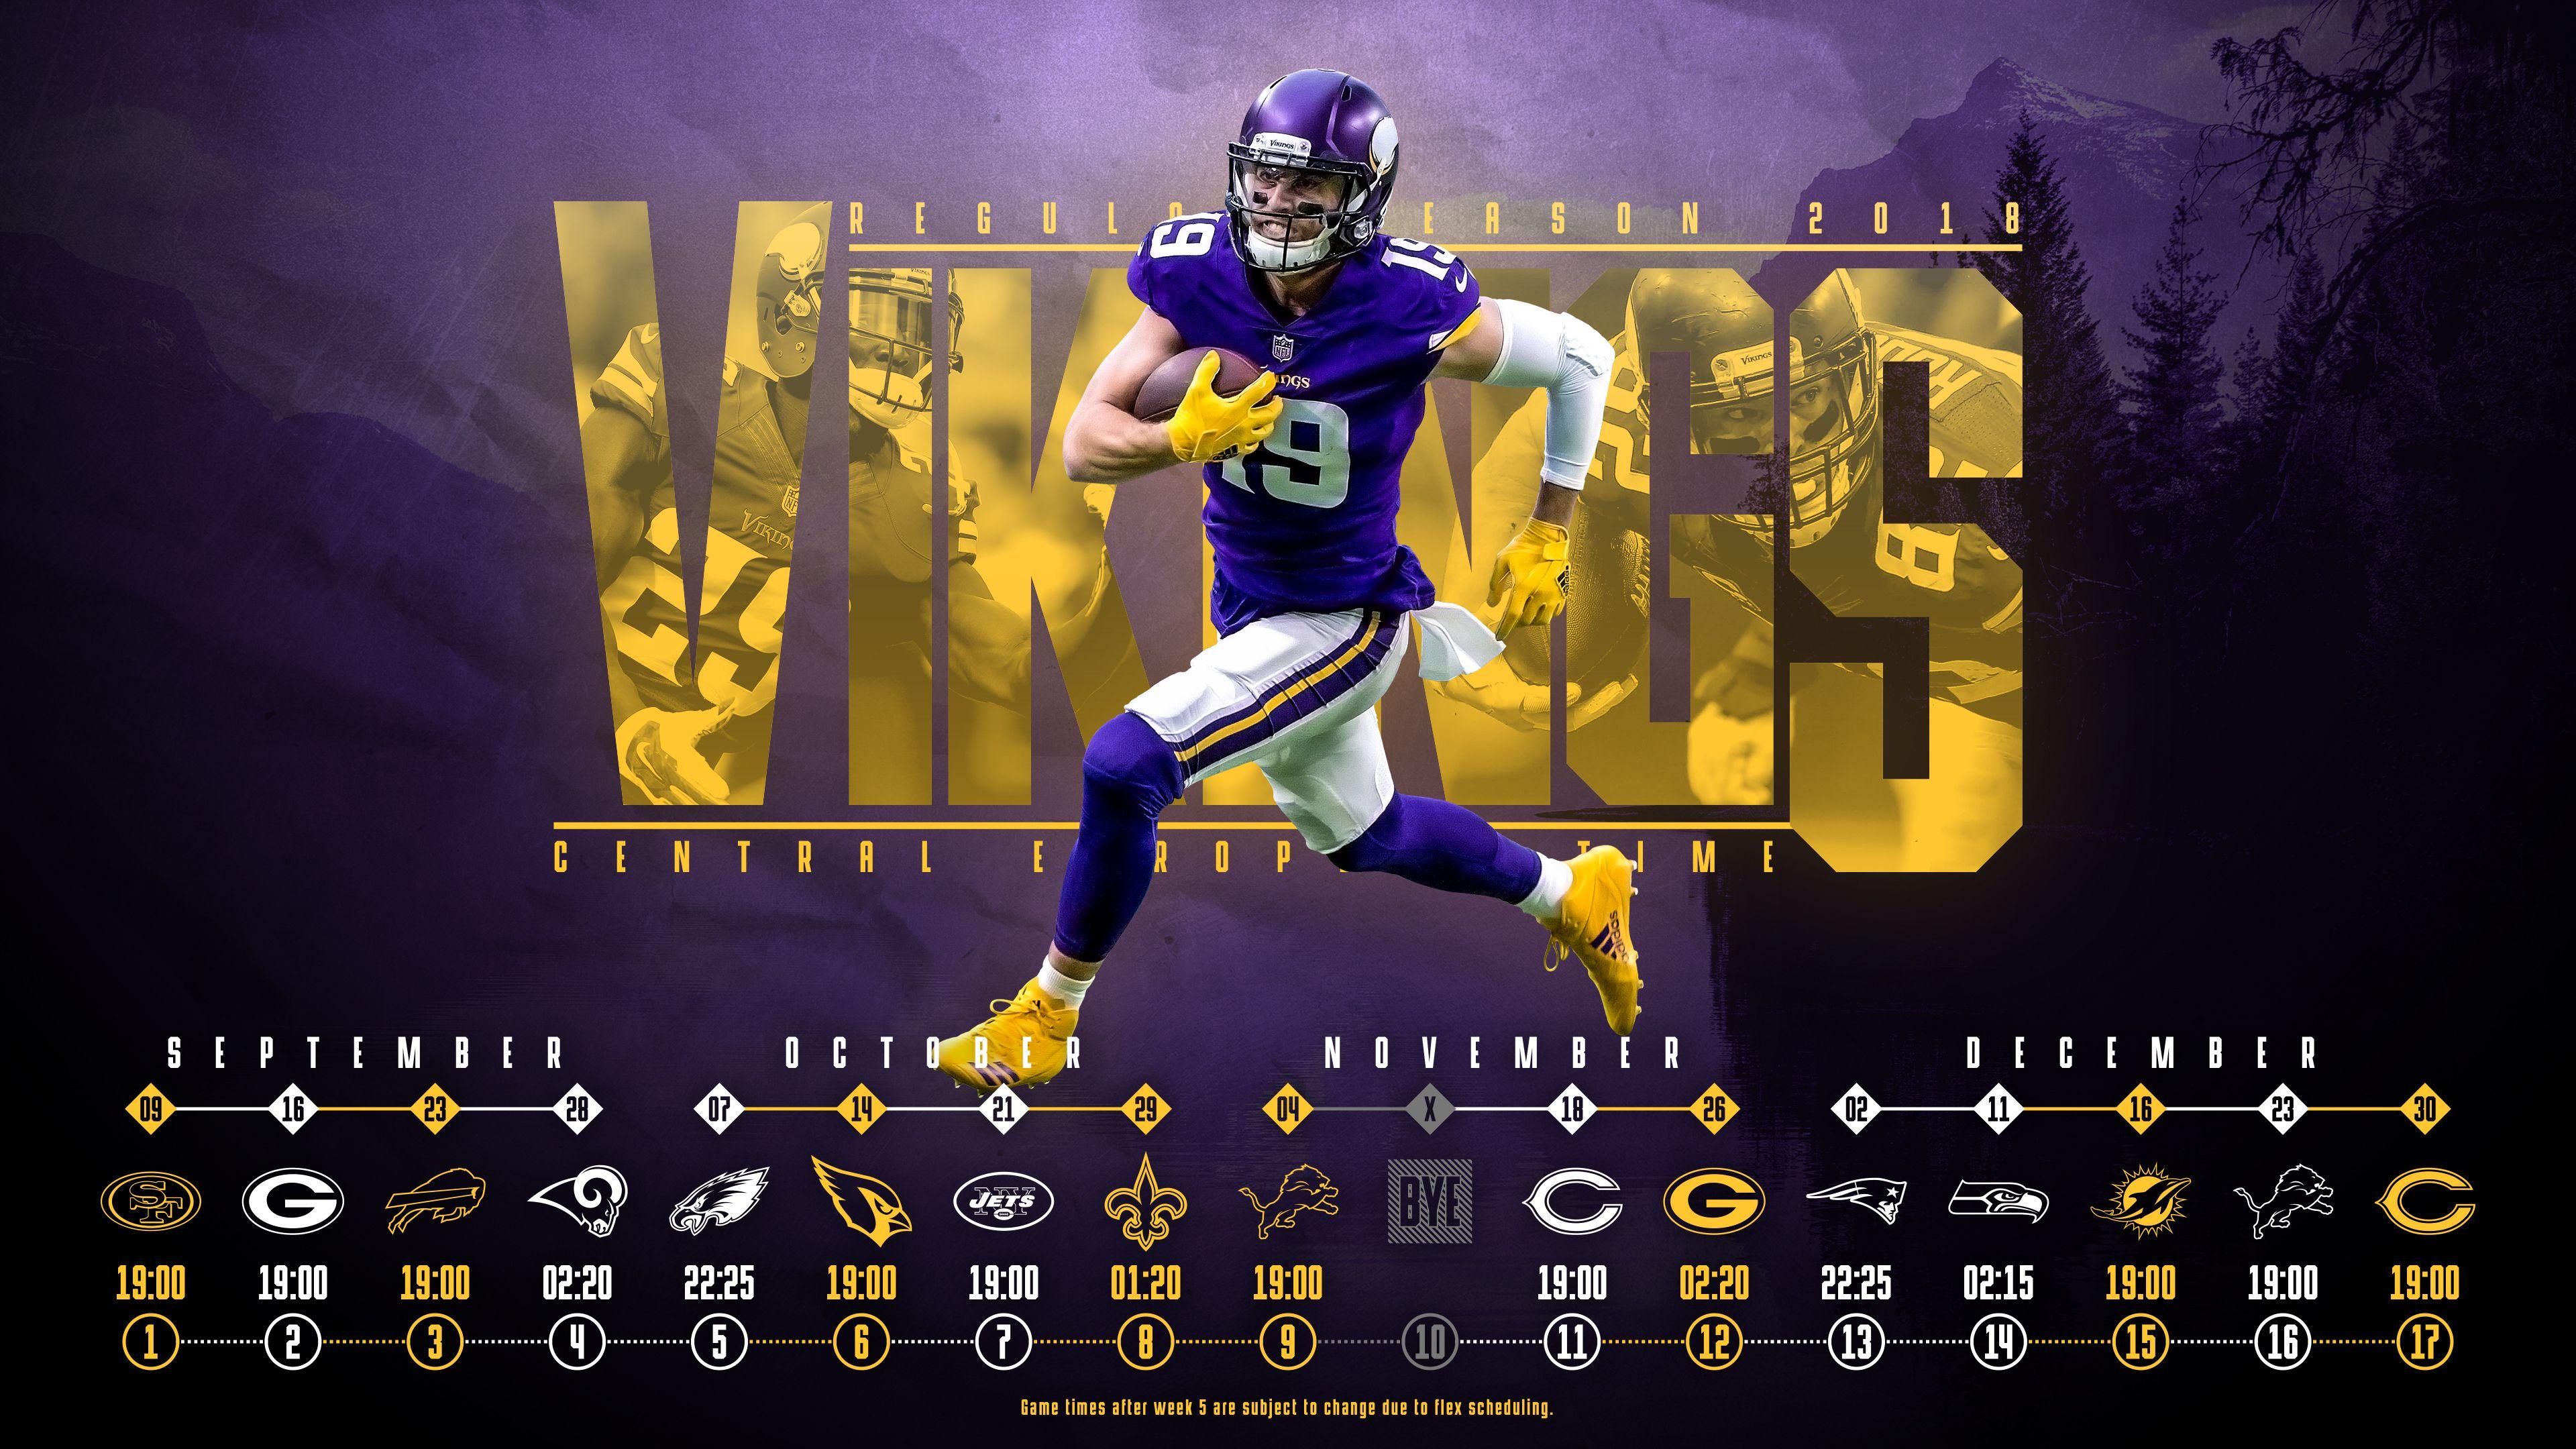 Schedule wallpaper for the Minnesota Vikings Regular